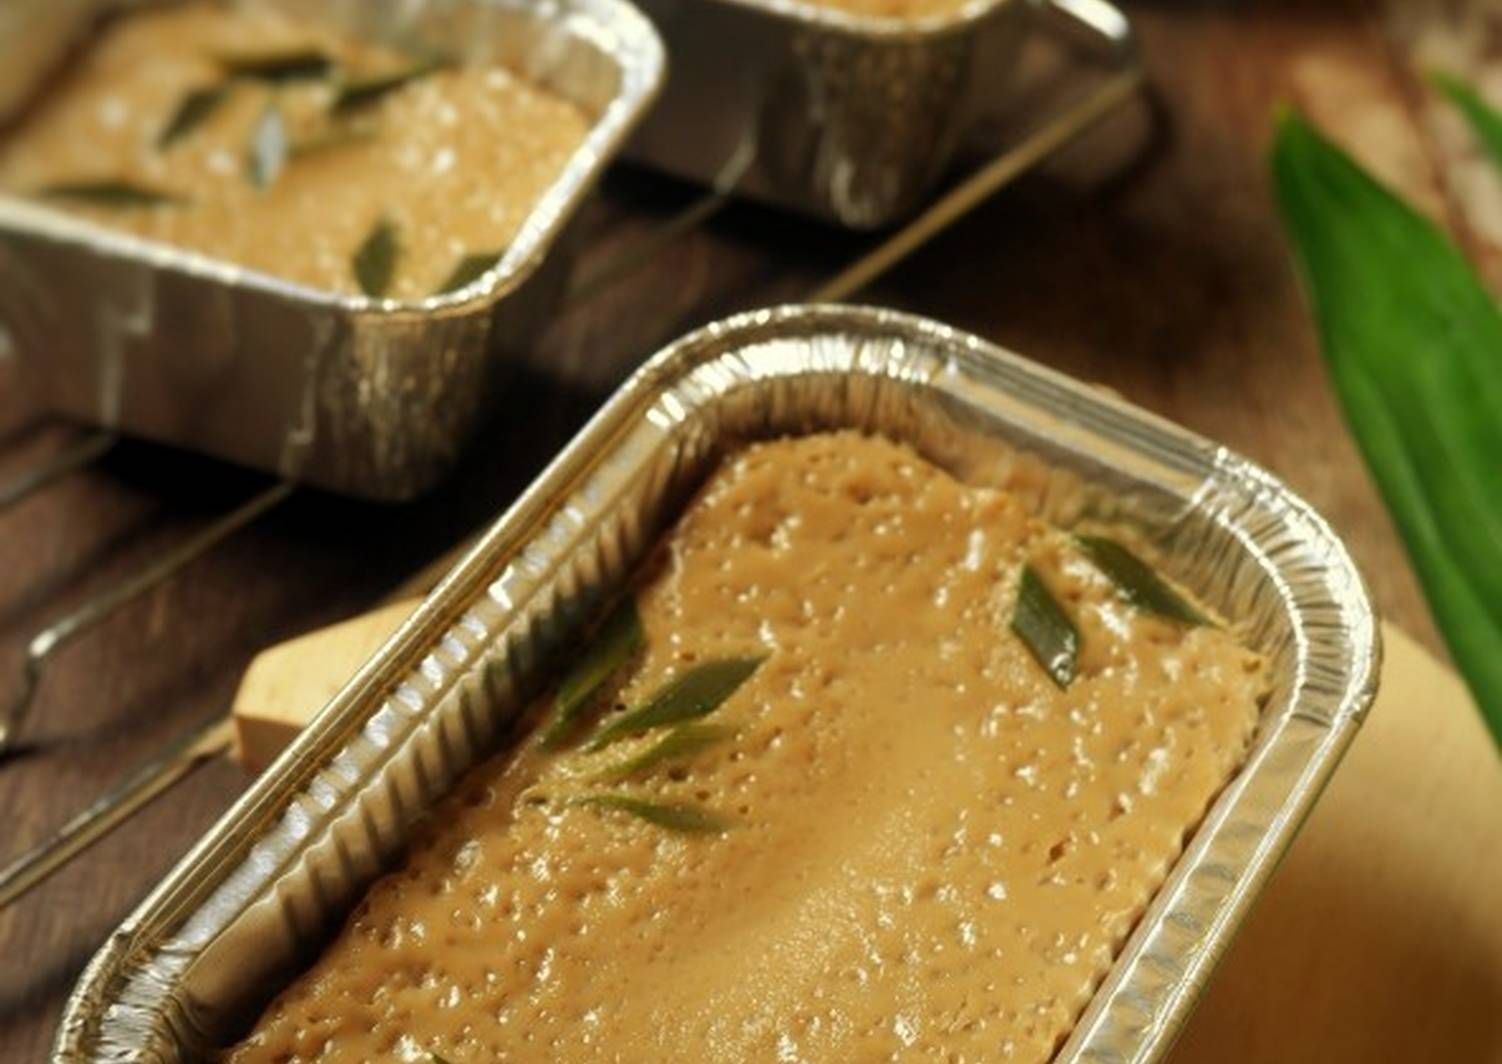 Resep Srikaya Gula Merah Ala Ummu Nahkwa Oleh Ummu Nahkwa Kitchen Resep Gula Adonan